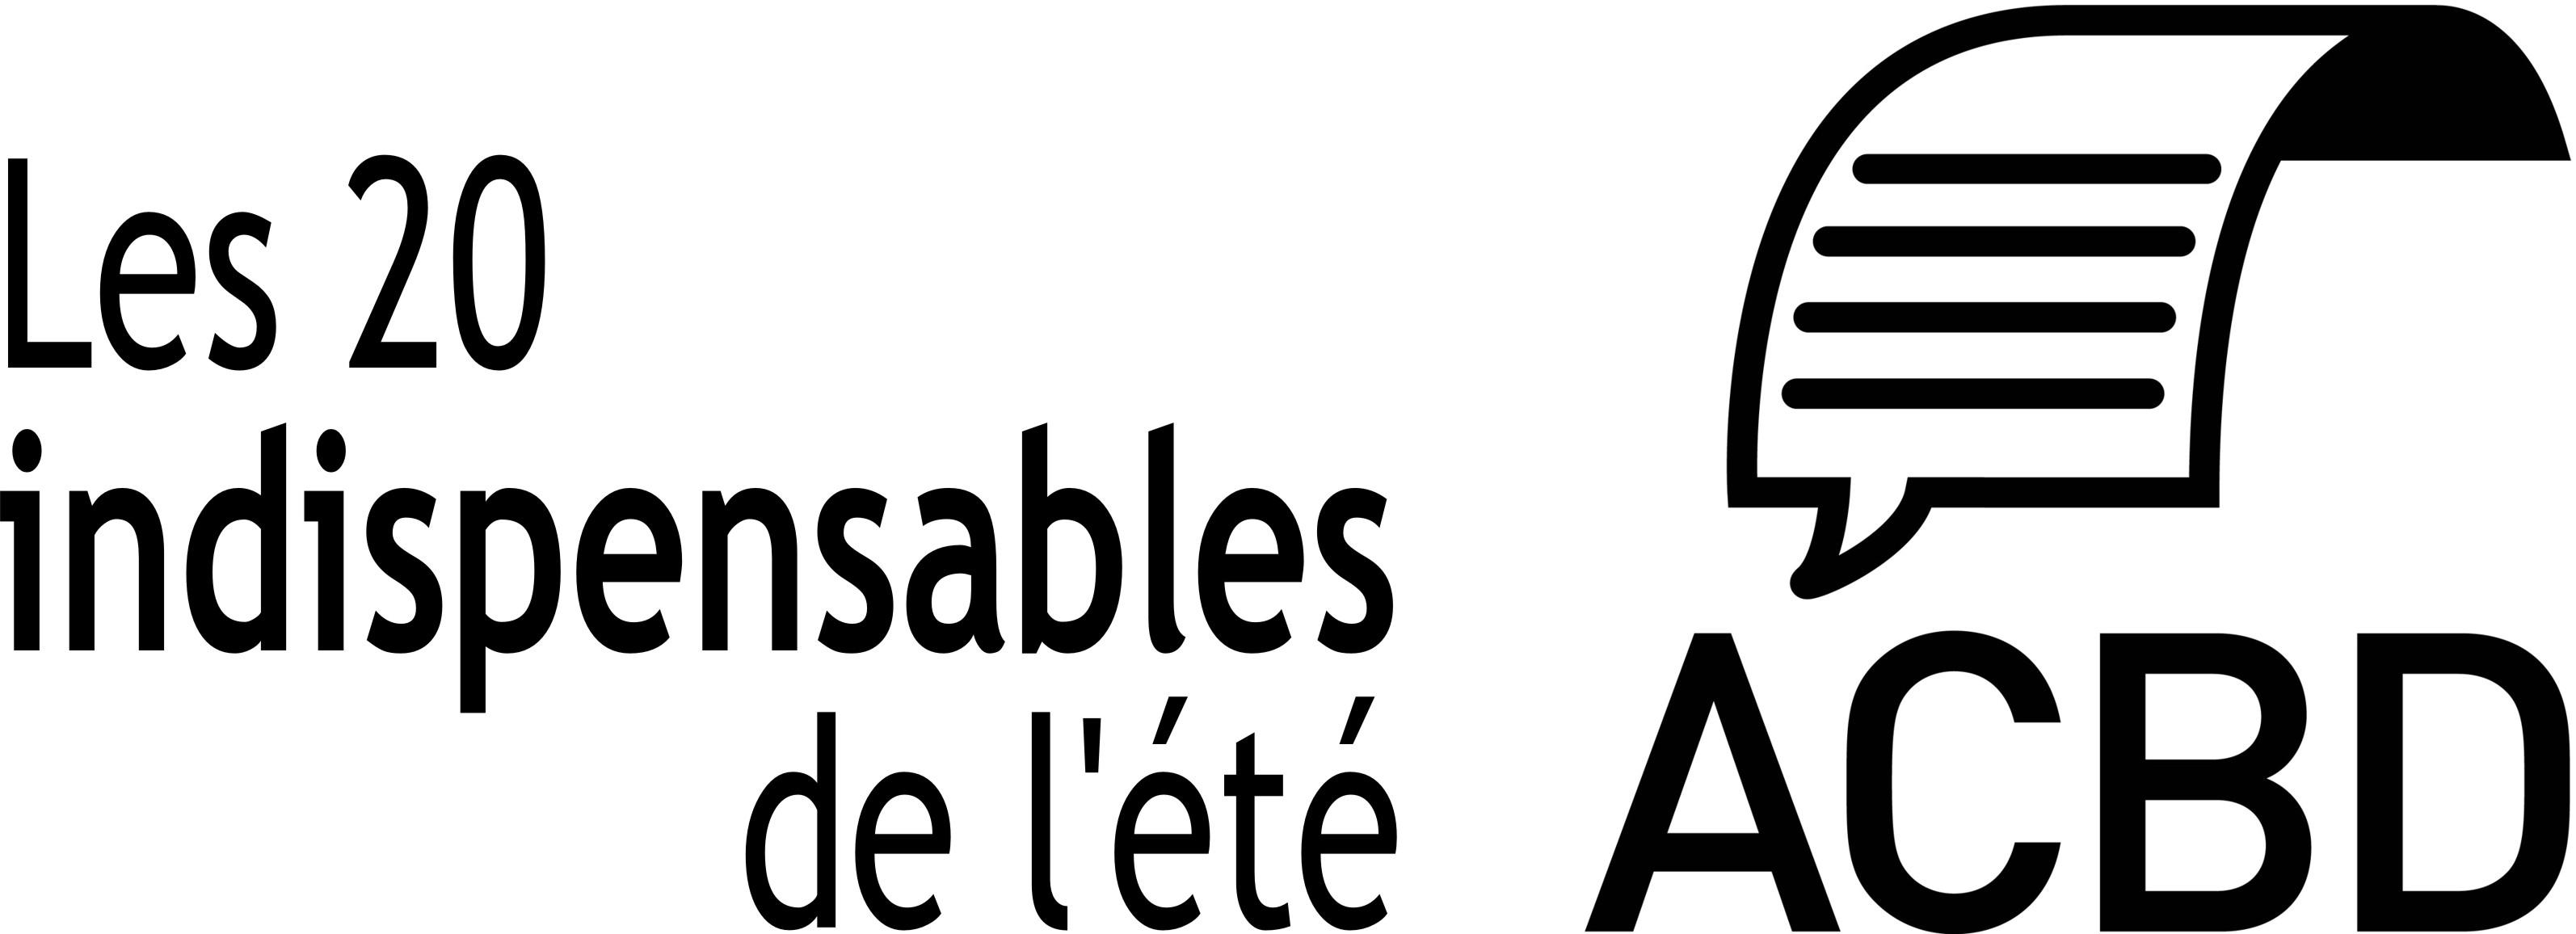 ACBD_indispensables_LOGO